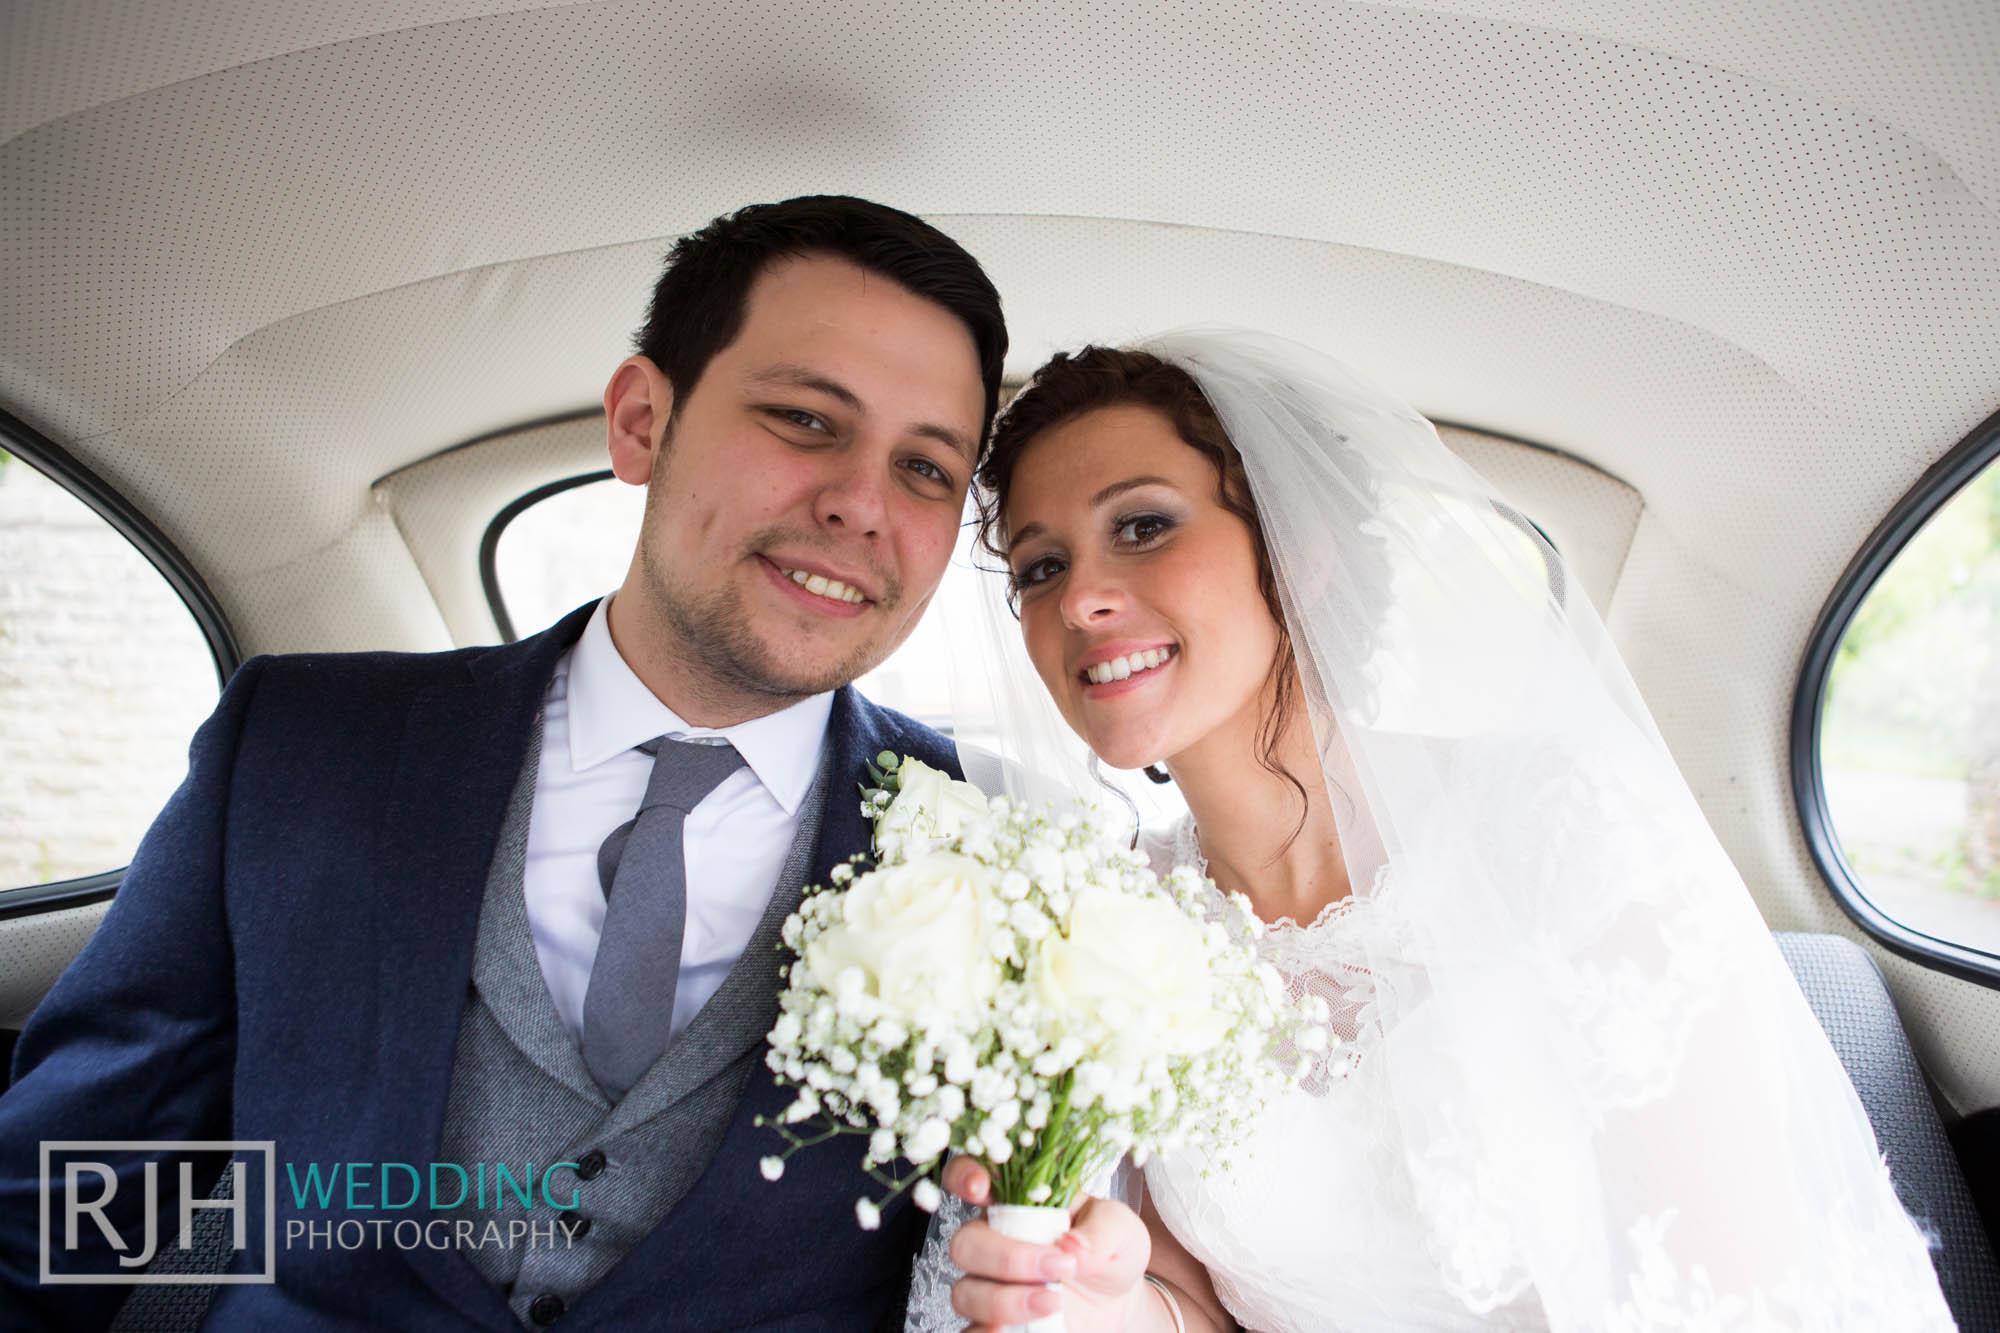 Whitley Hall Marples Wedding_244_3C2A8875.jpg